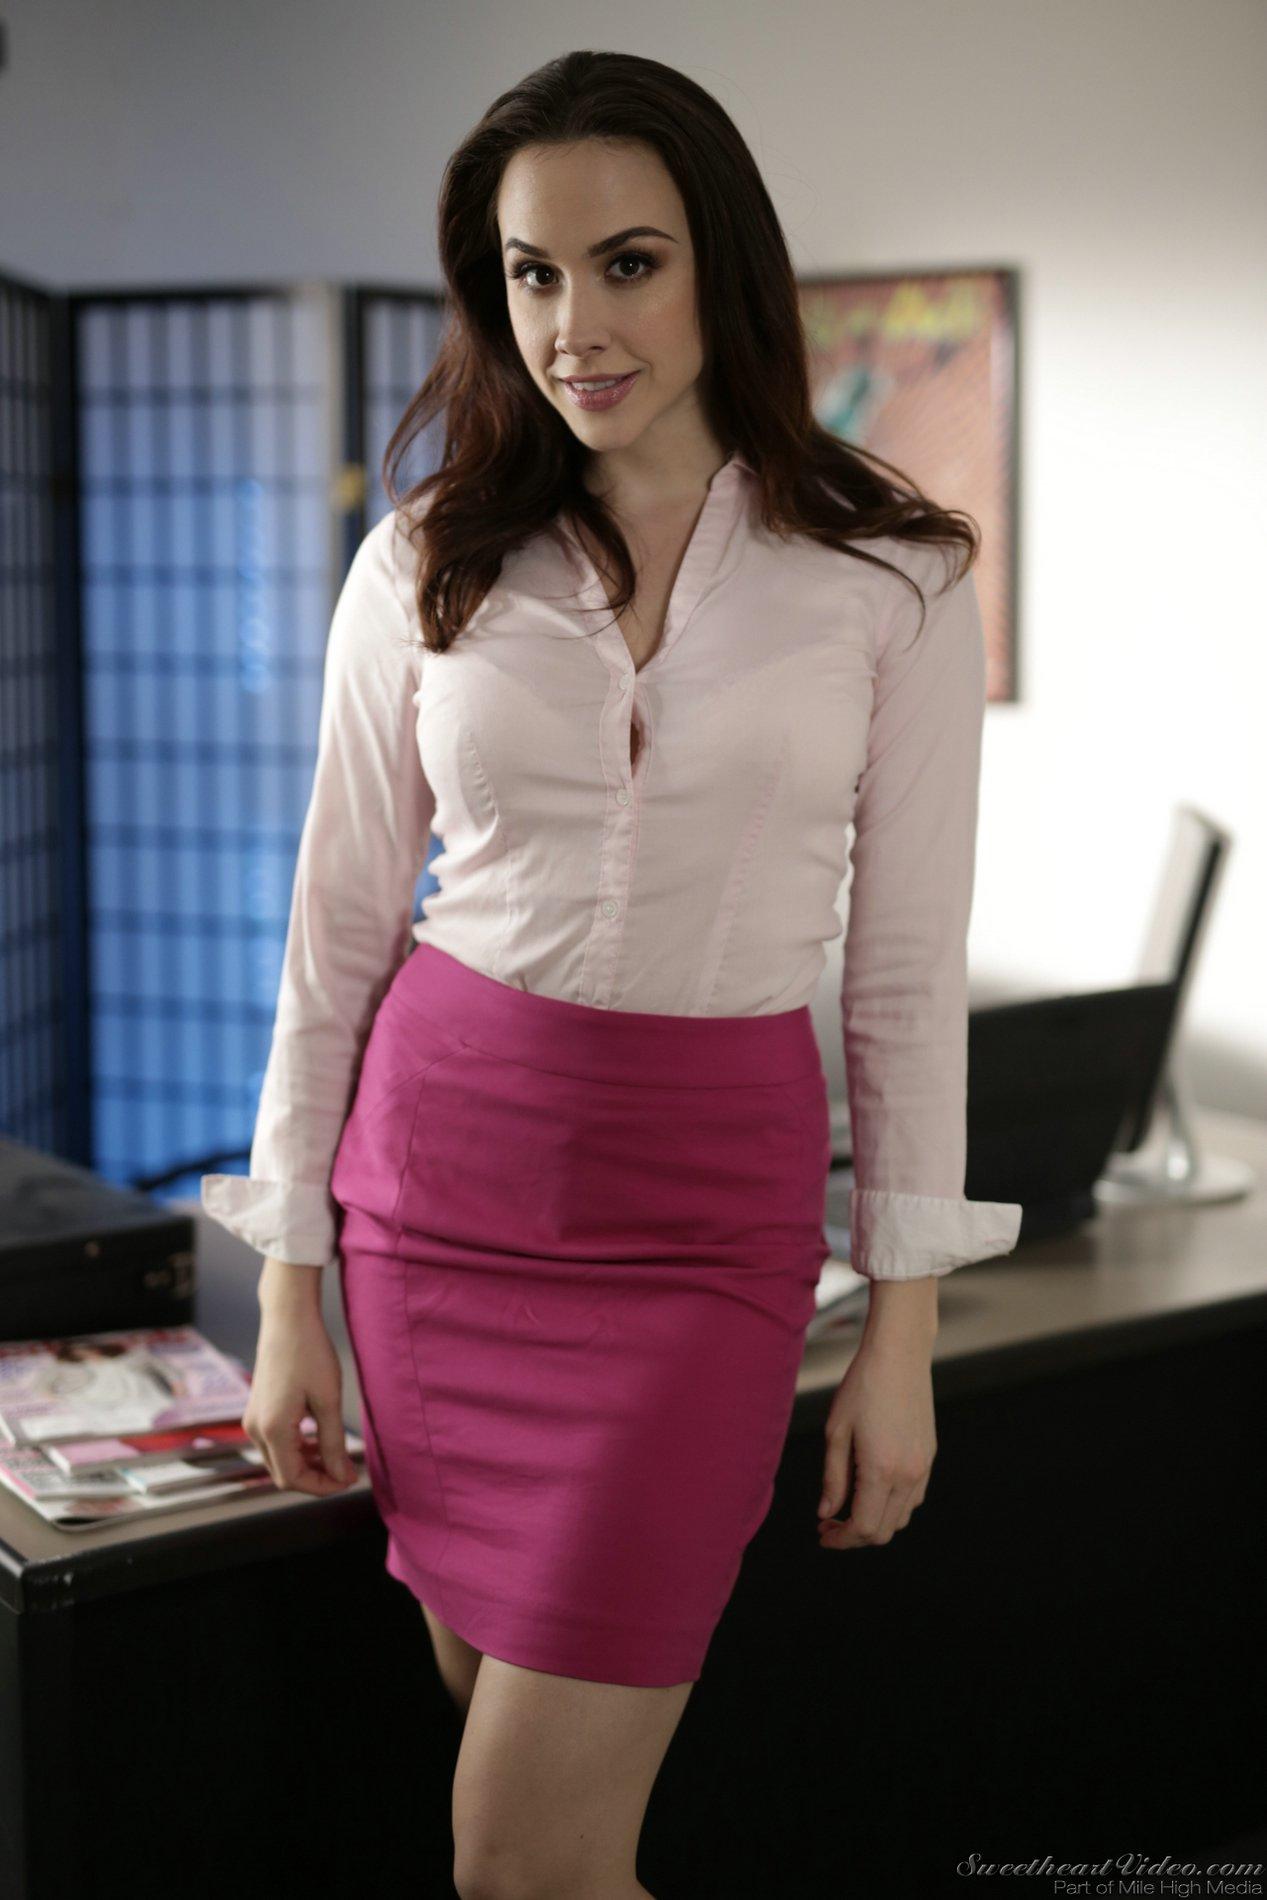 chanel preston secretary